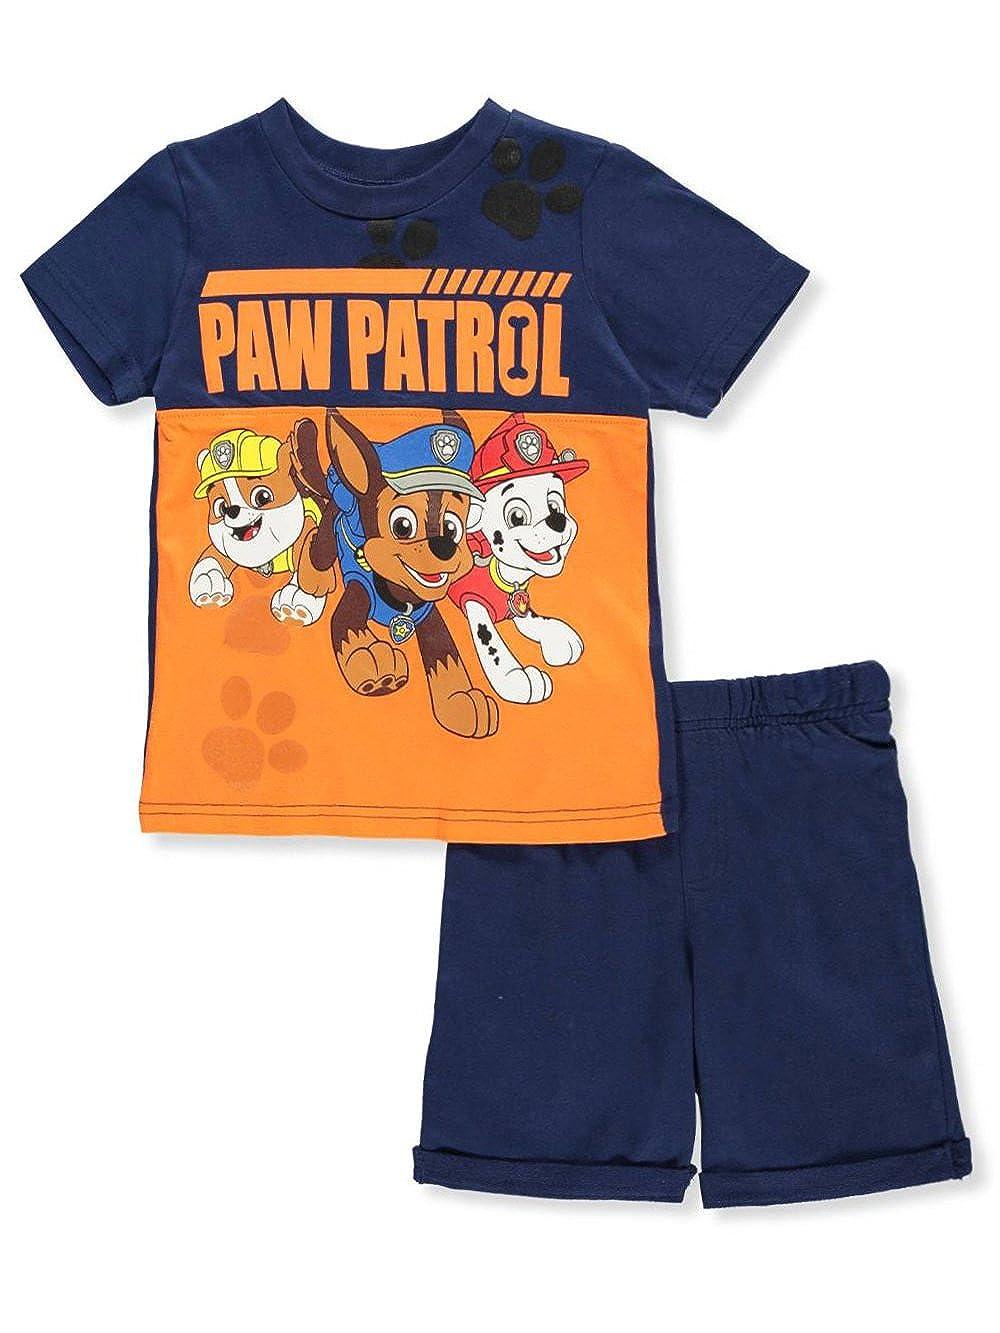 Cookie's Kids Paw Patrol Boys' 2-Piece Short Set Outfit 6